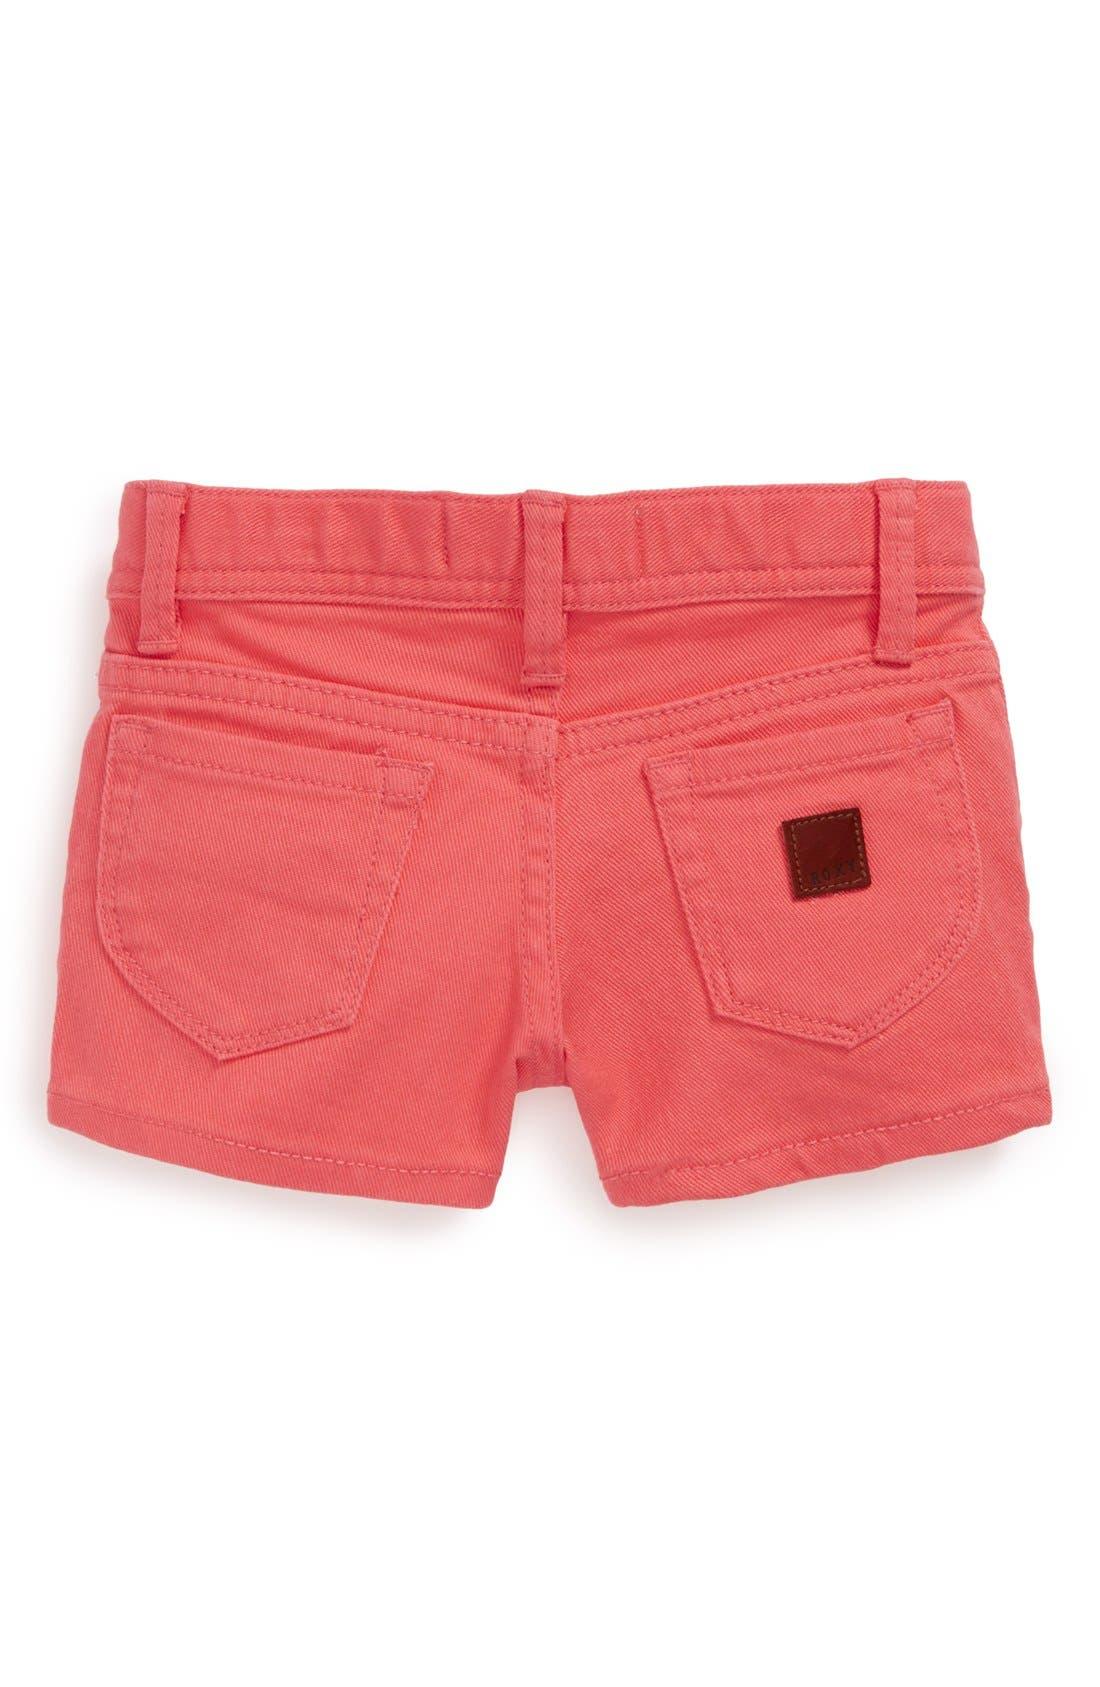 Alternate Image 1 Selected - Roxy 'Lisy' Shorts (Toddler Girls)